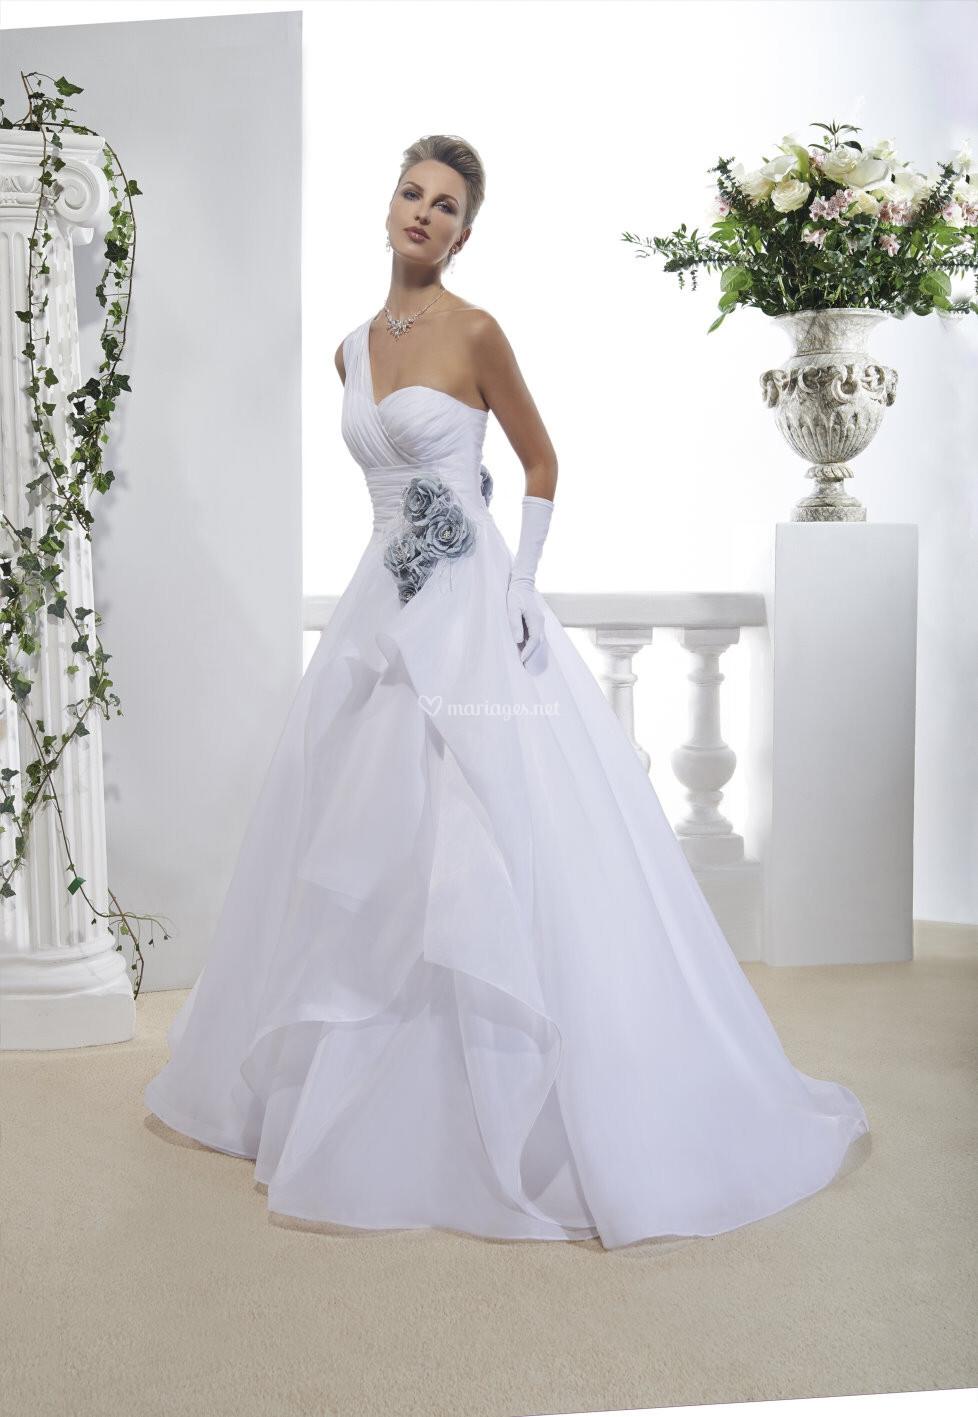 robes de mari e sur annie couture couronnee